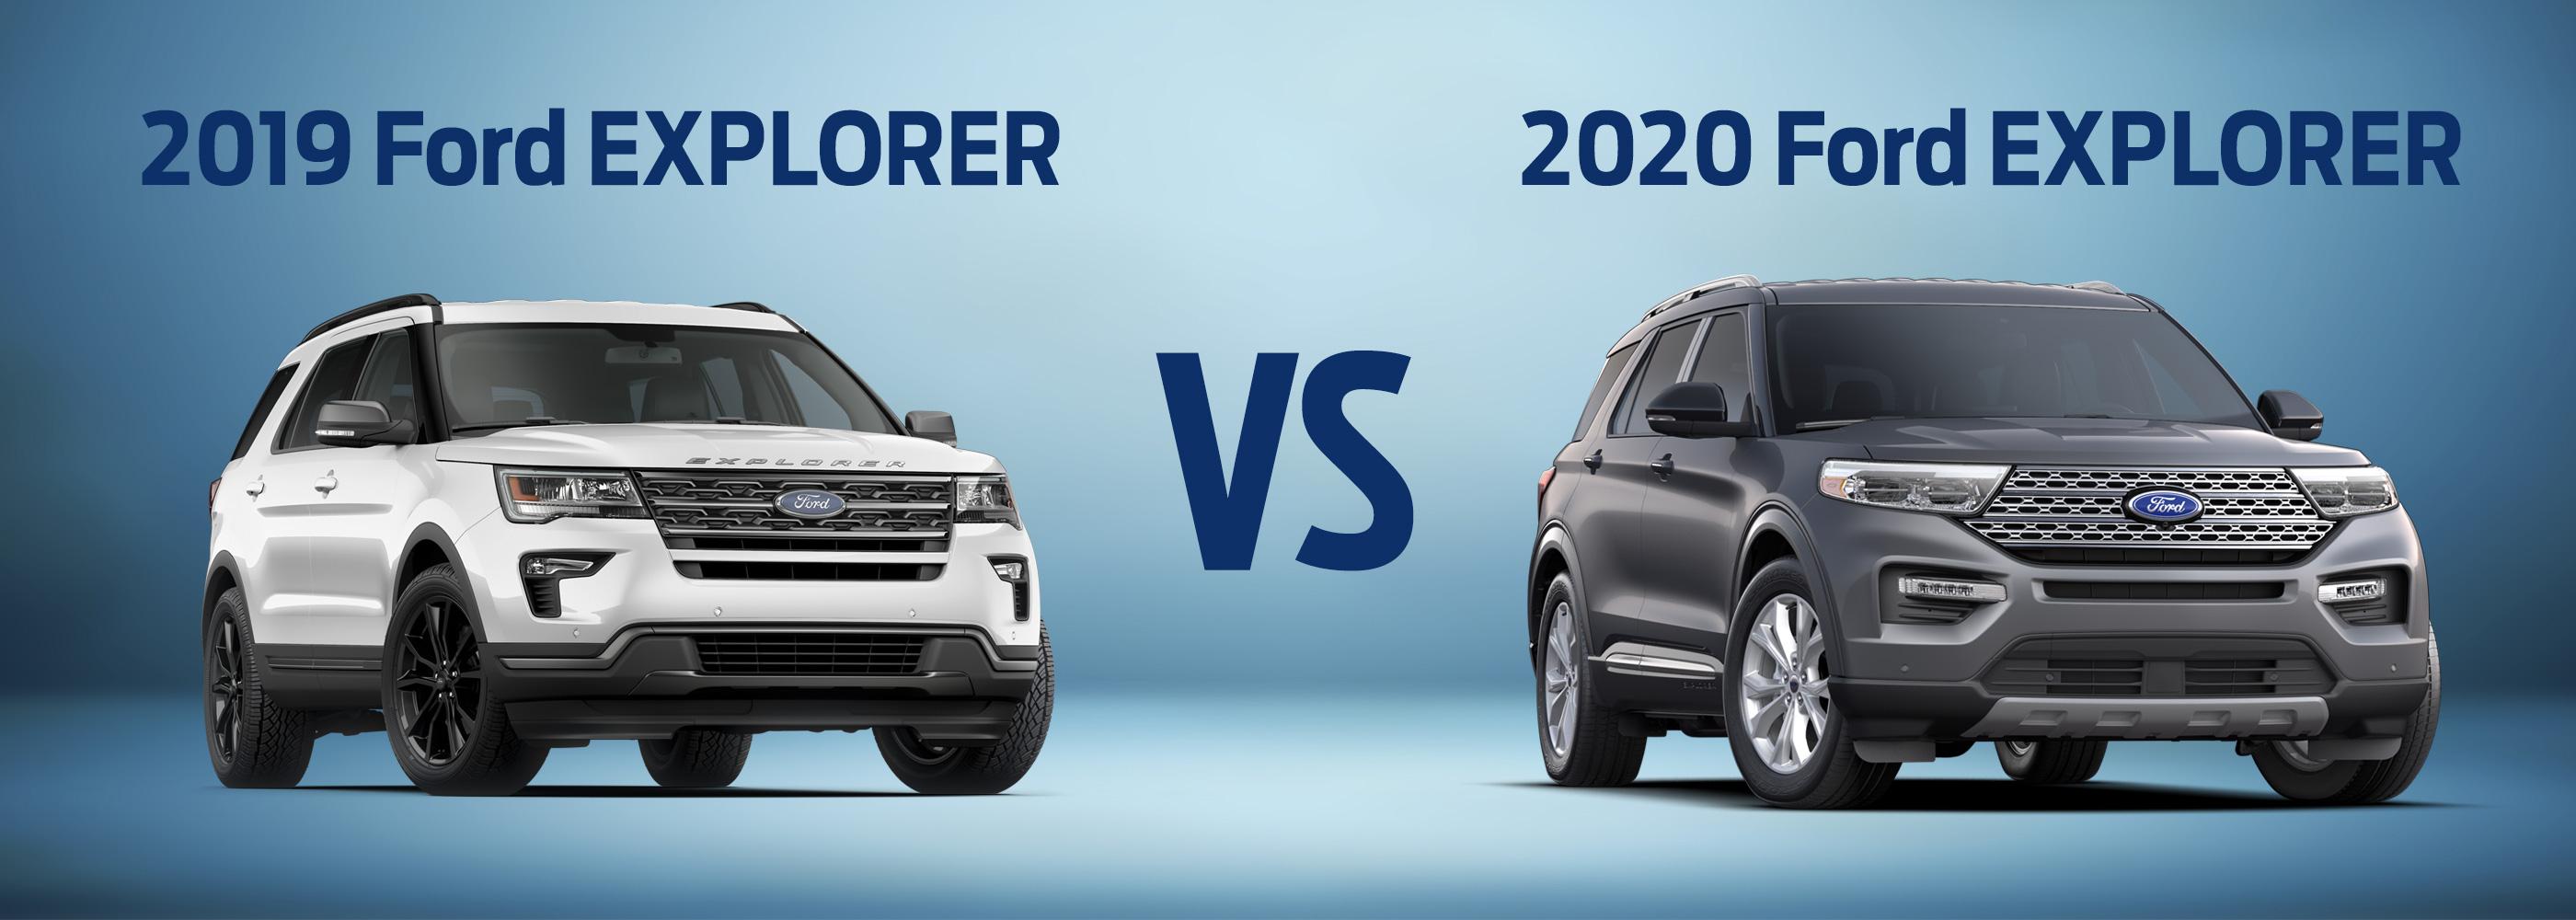 2019 Ford Explorer Vs 2020 Ford Explorer Near Minneapolis